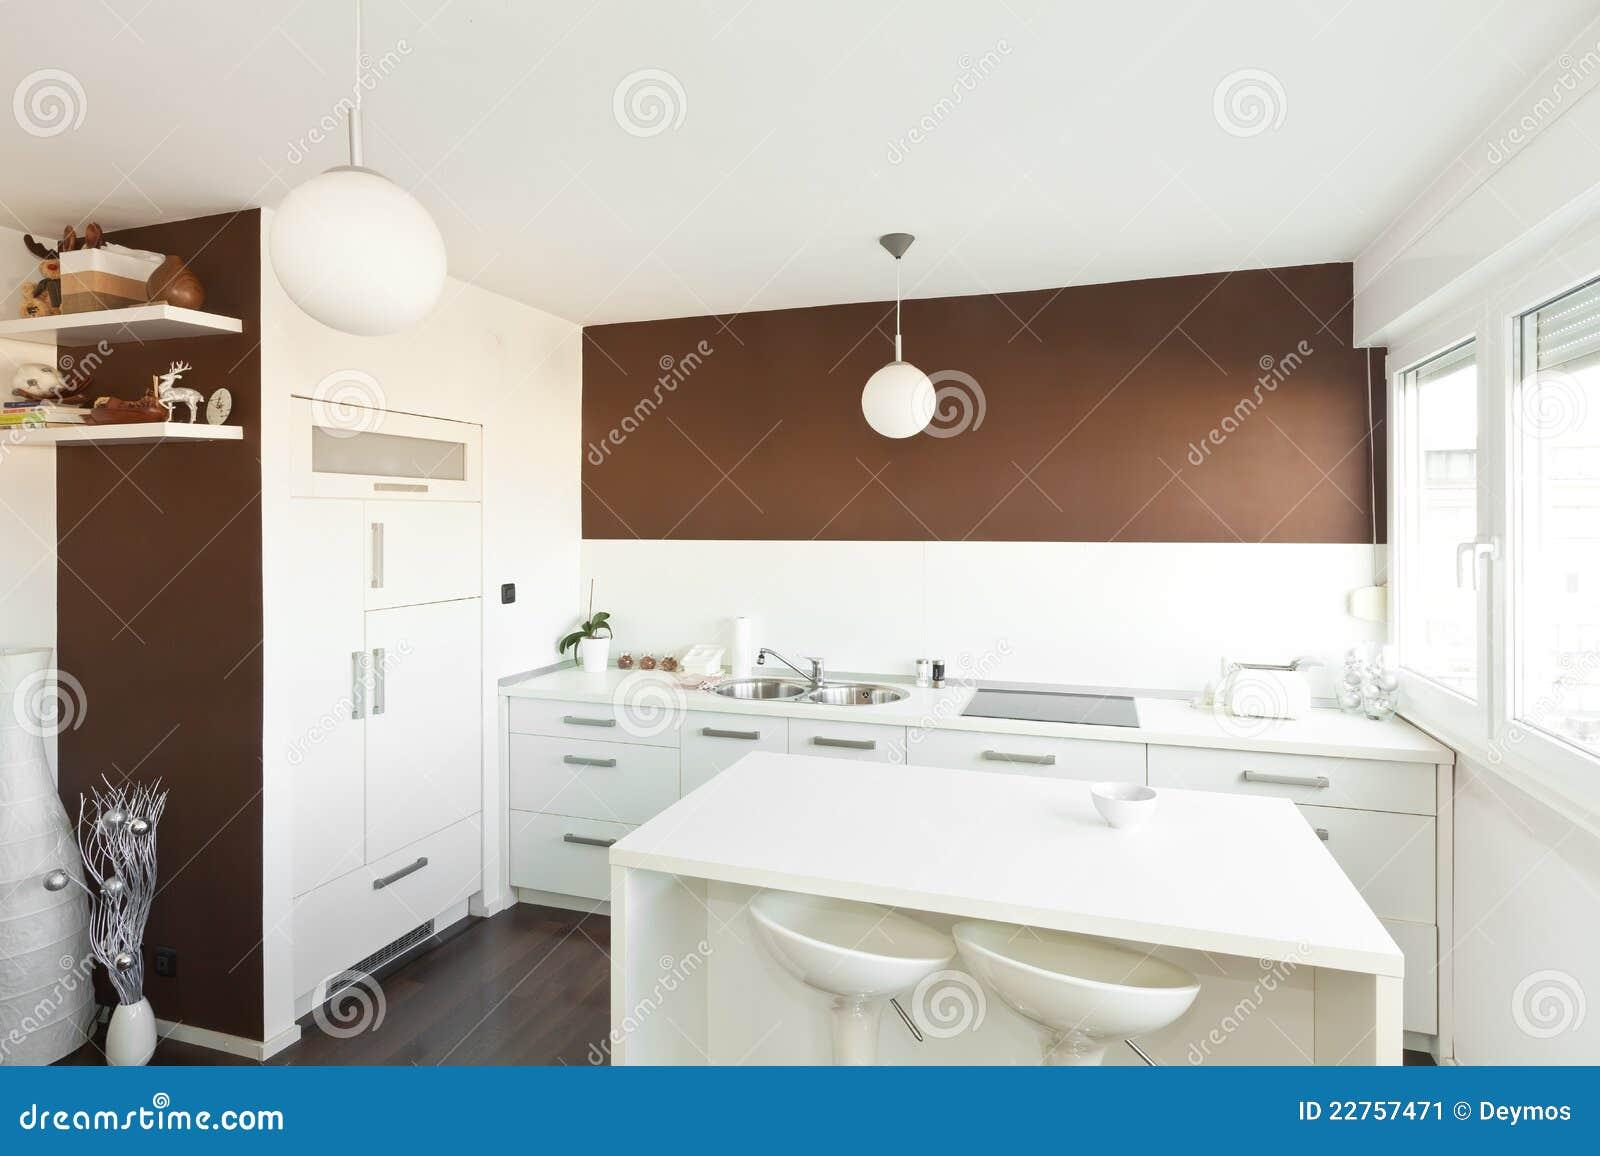 Moderne keuken met bruine muur stock afbeelding beeld 22757471 - Keuken met teller ...